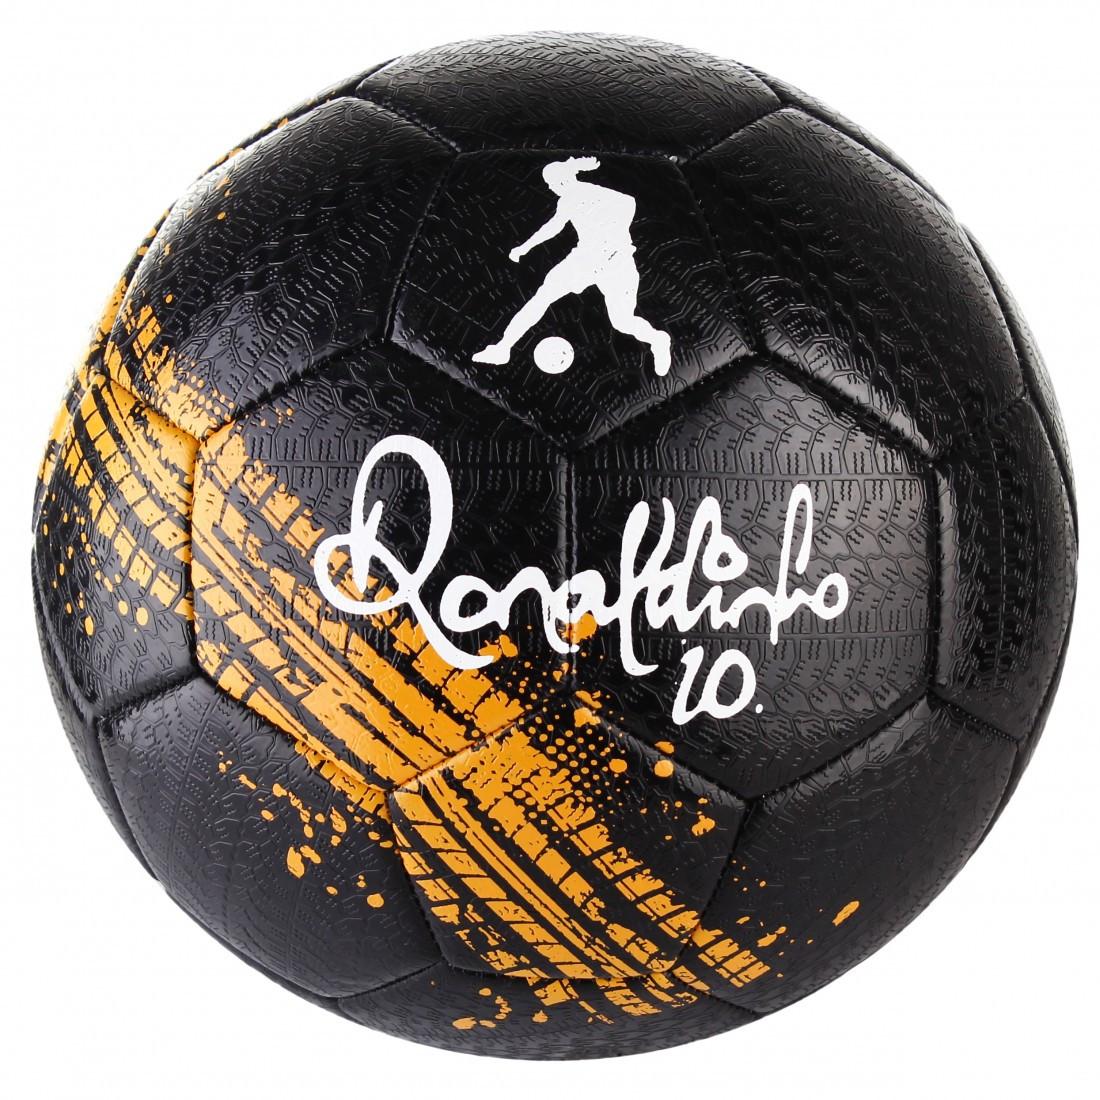 Футбольный мяч Dunlop Soccer ball street Ronaldinho